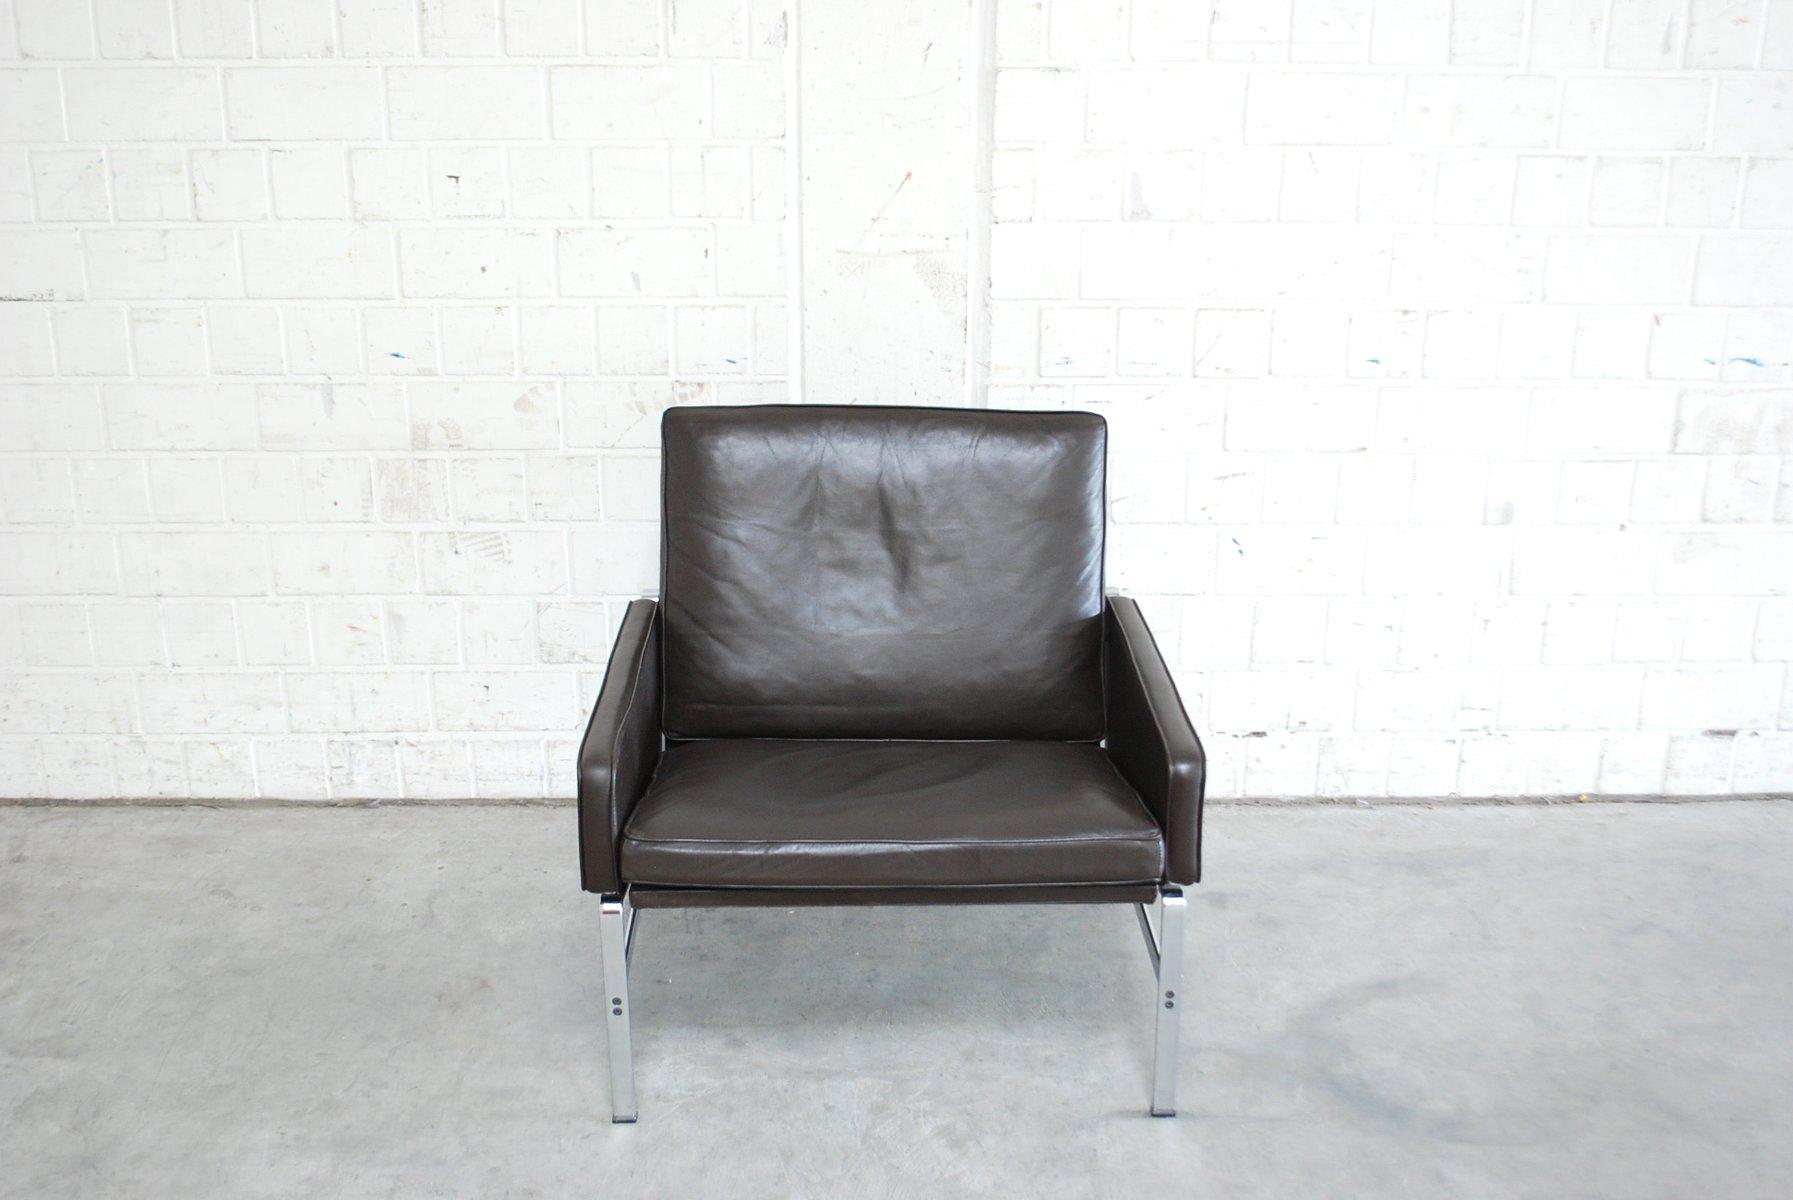 vintage modell 6720 sessel von kastholm fabricius f r kill international bei pamono kaufen. Black Bedroom Furniture Sets. Home Design Ideas